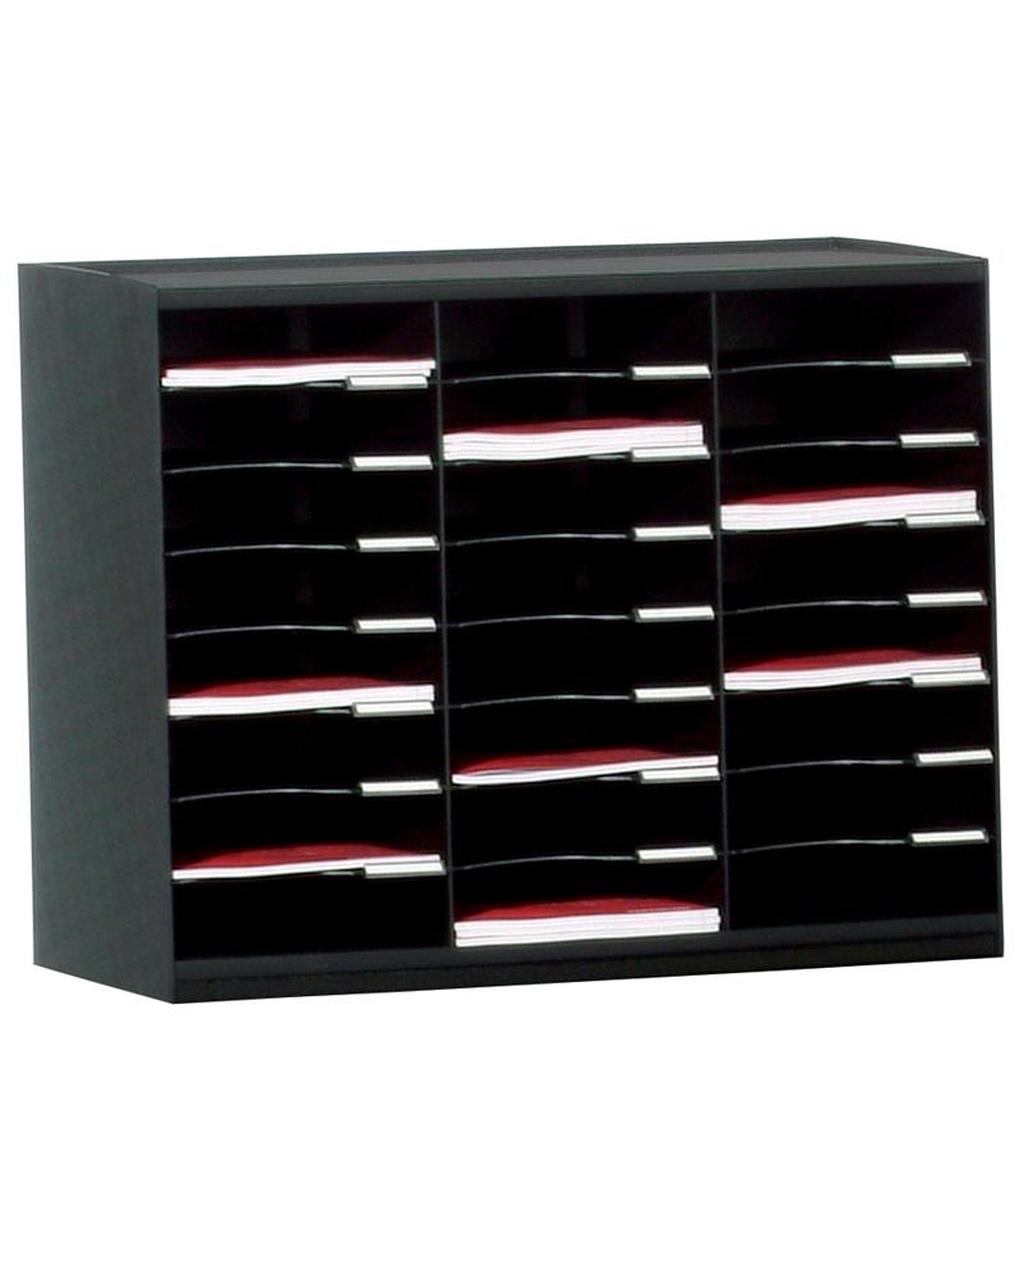 24 Compartment Mailsorter Black